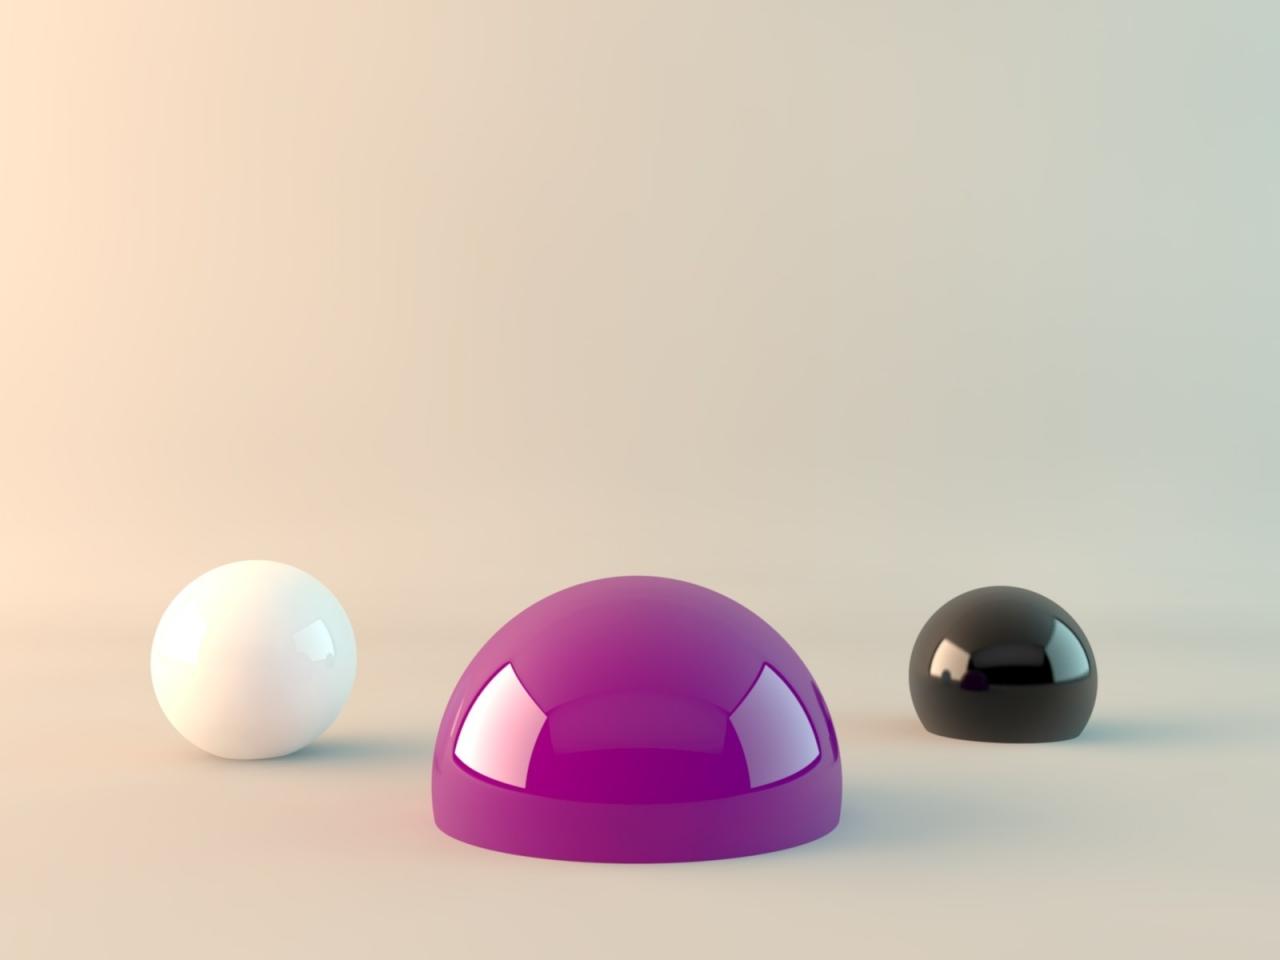 Abstracto objetos - 1280x960